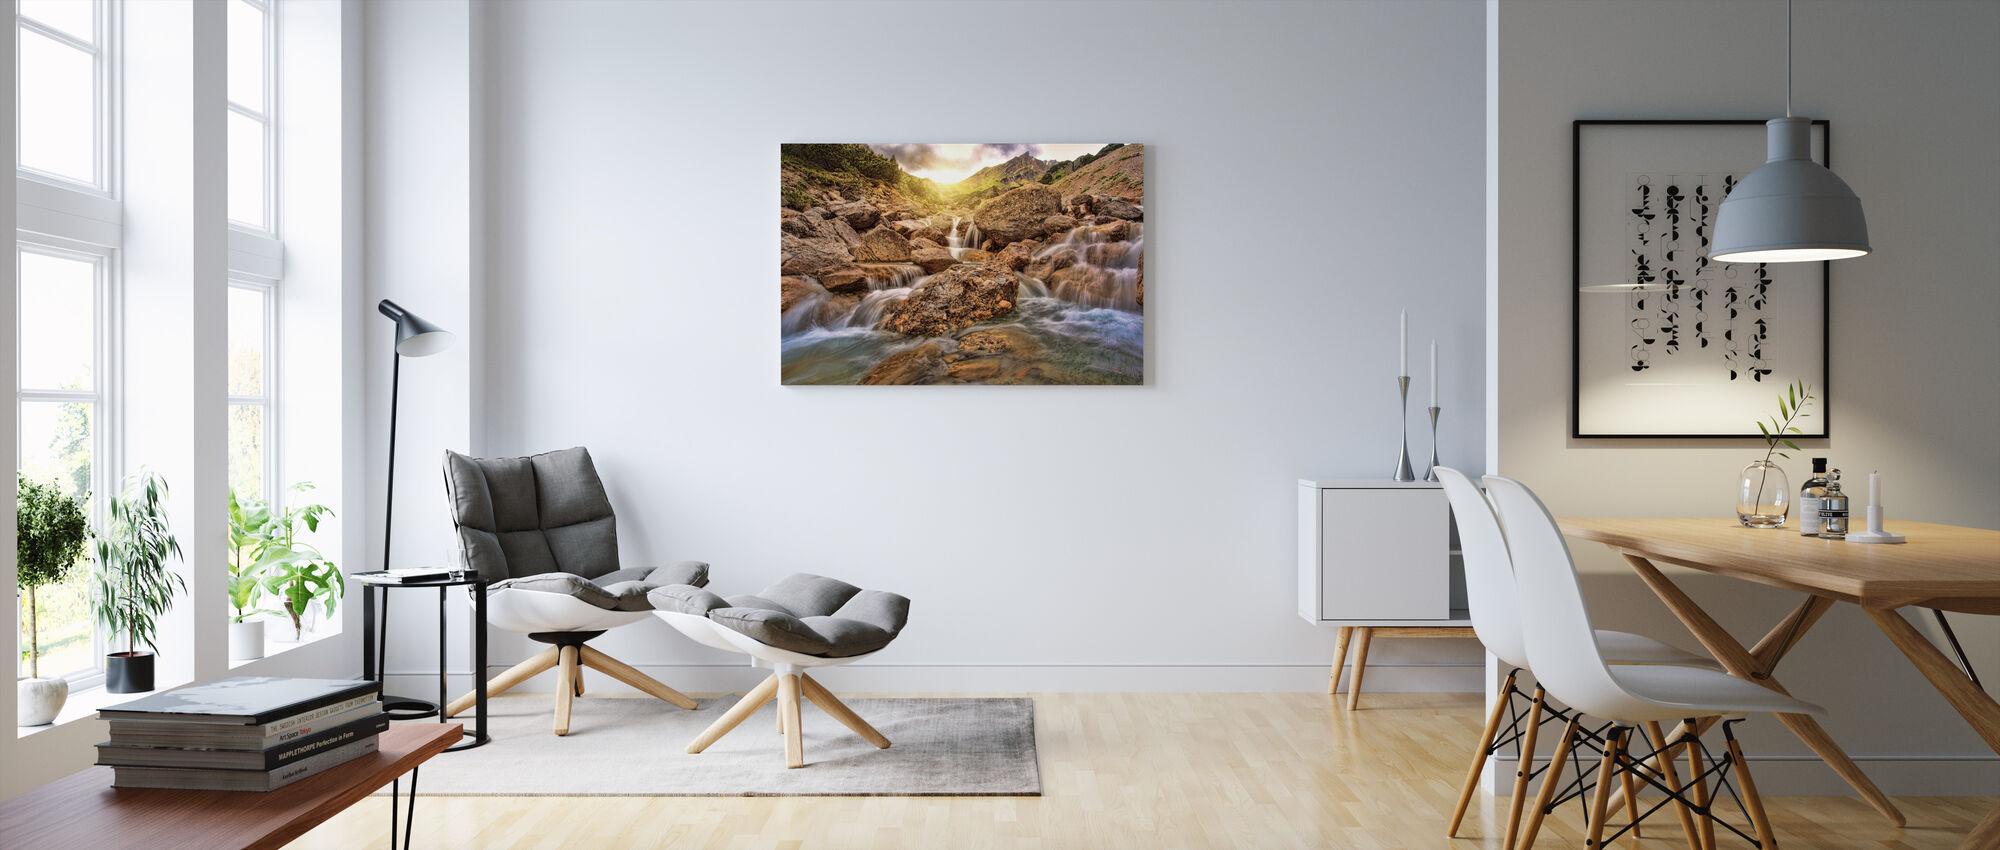 Joki Sunset - Canvastaulu - Olohuone